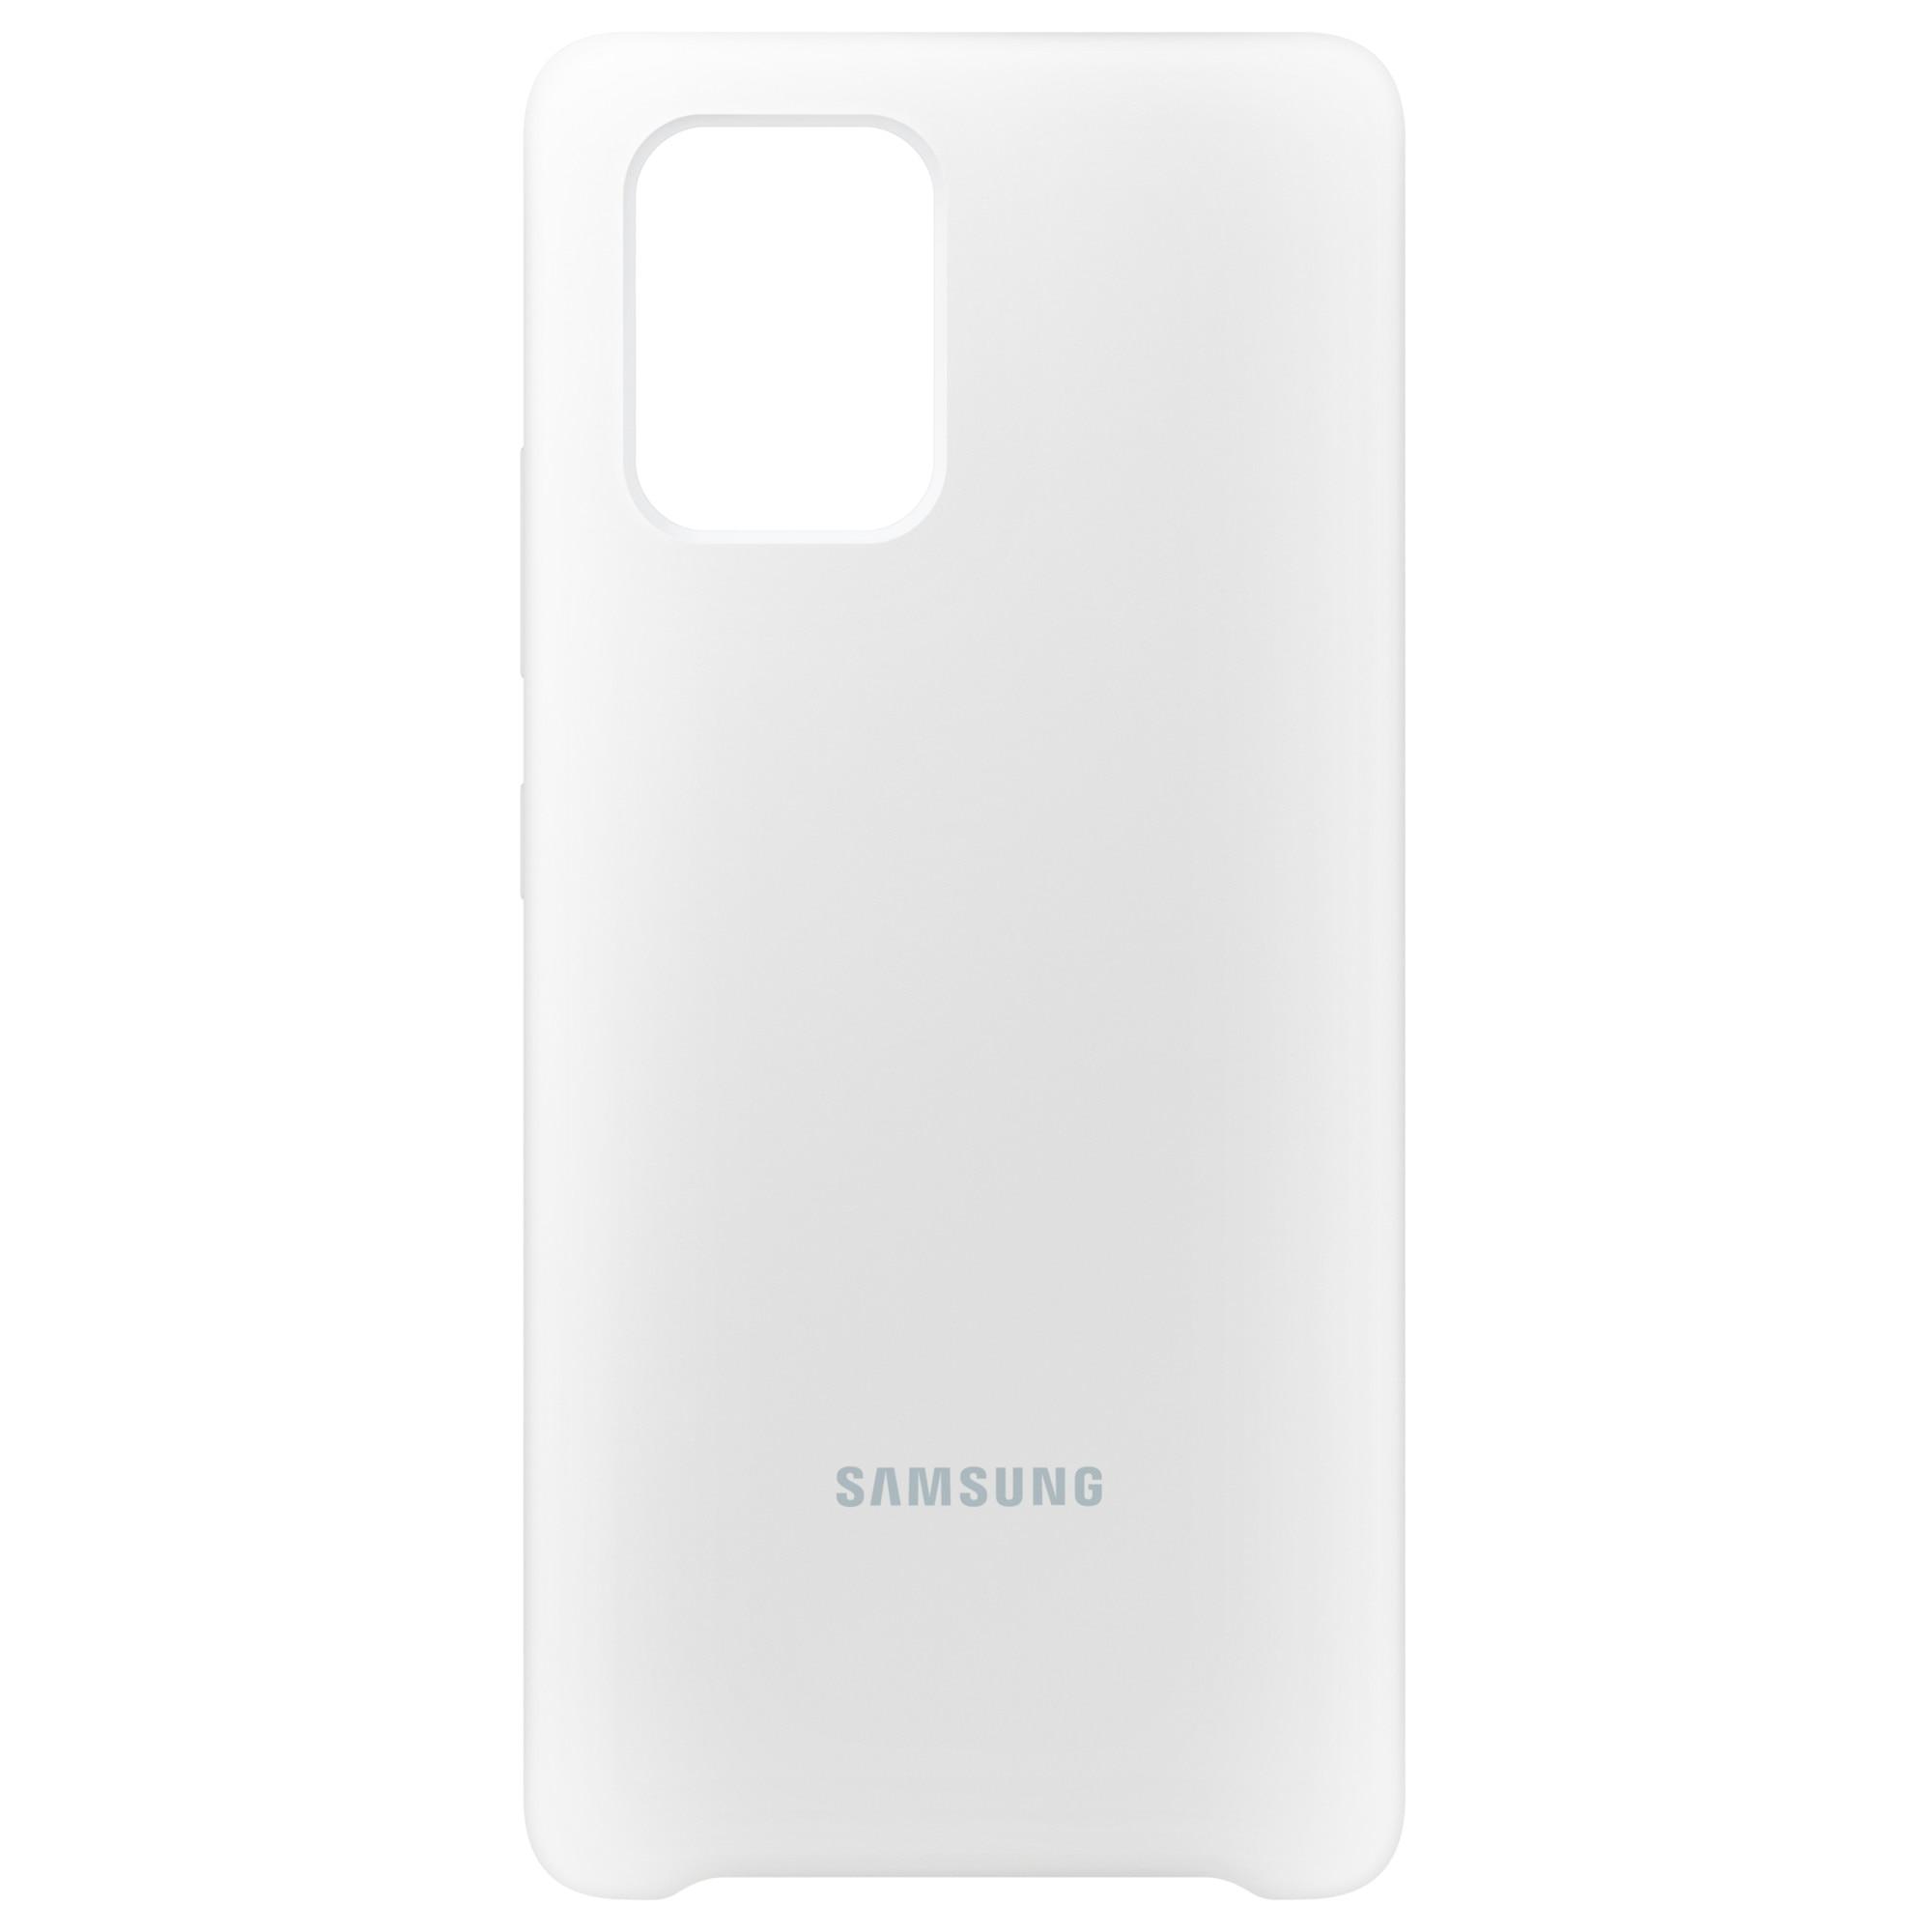 Fotografie Husa de protectie Samsung Silicone Cover pentru Galaxy S10 Lite, White